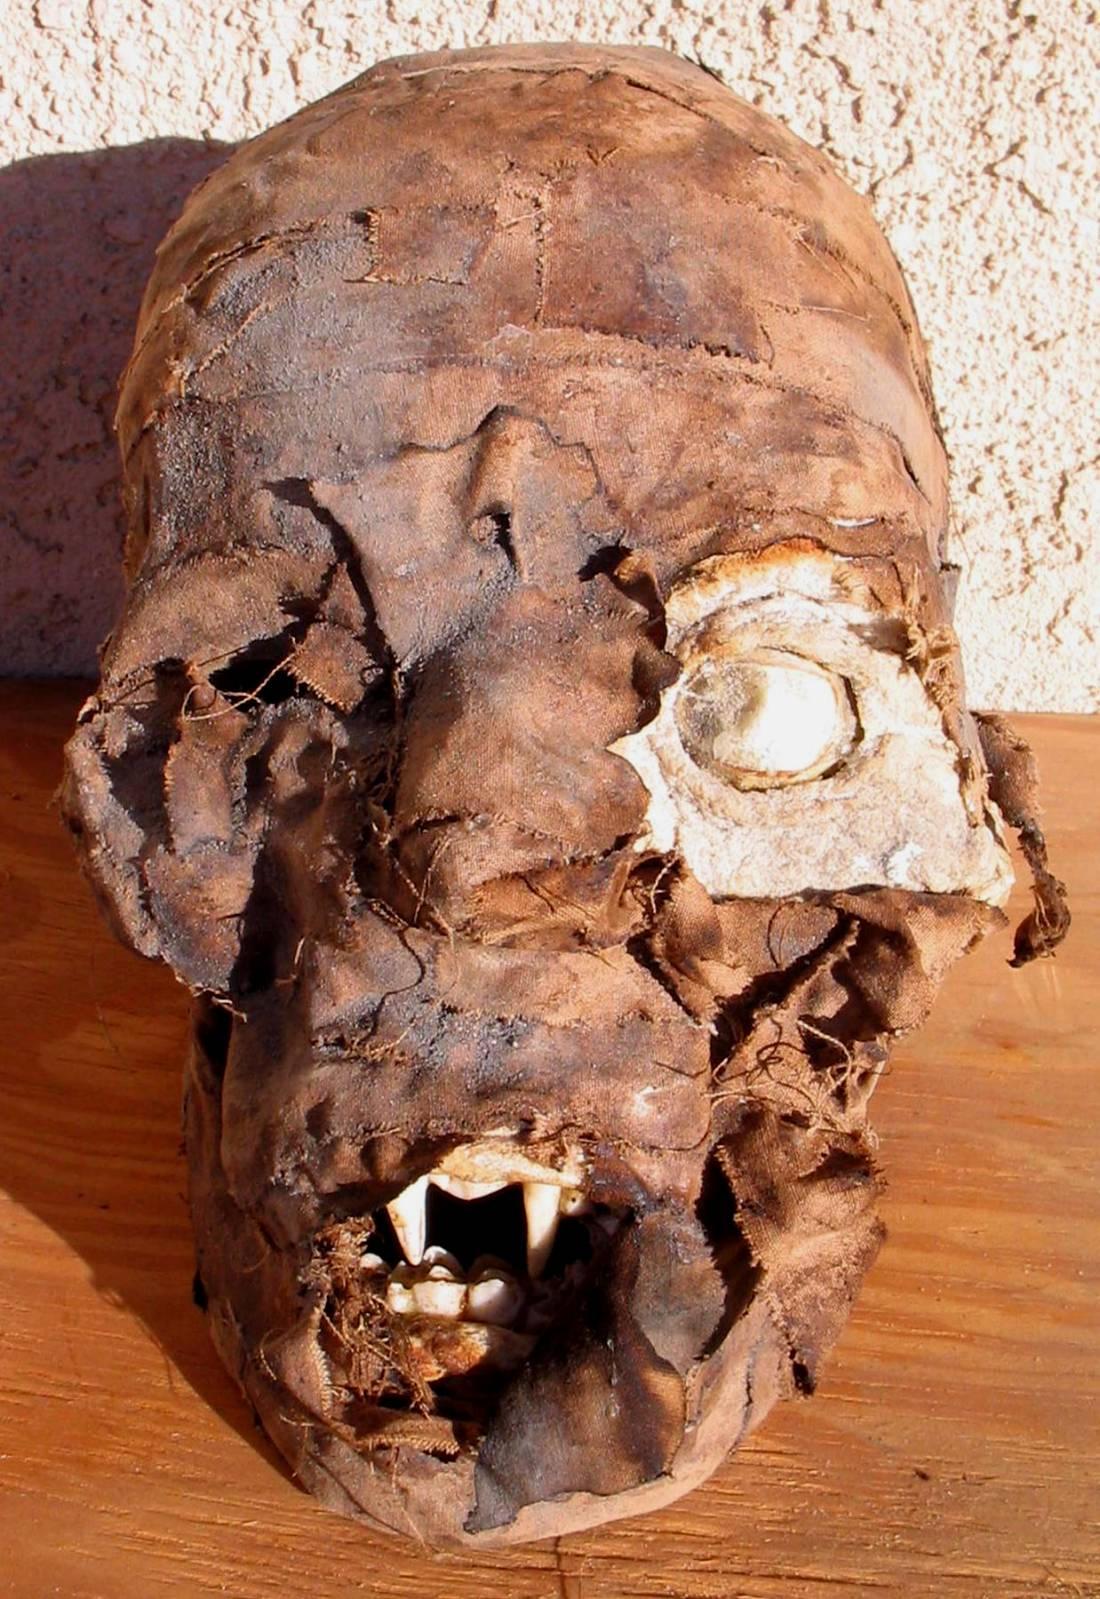 Mummified Head Of Vlad Dracula by DETHCHEEZ